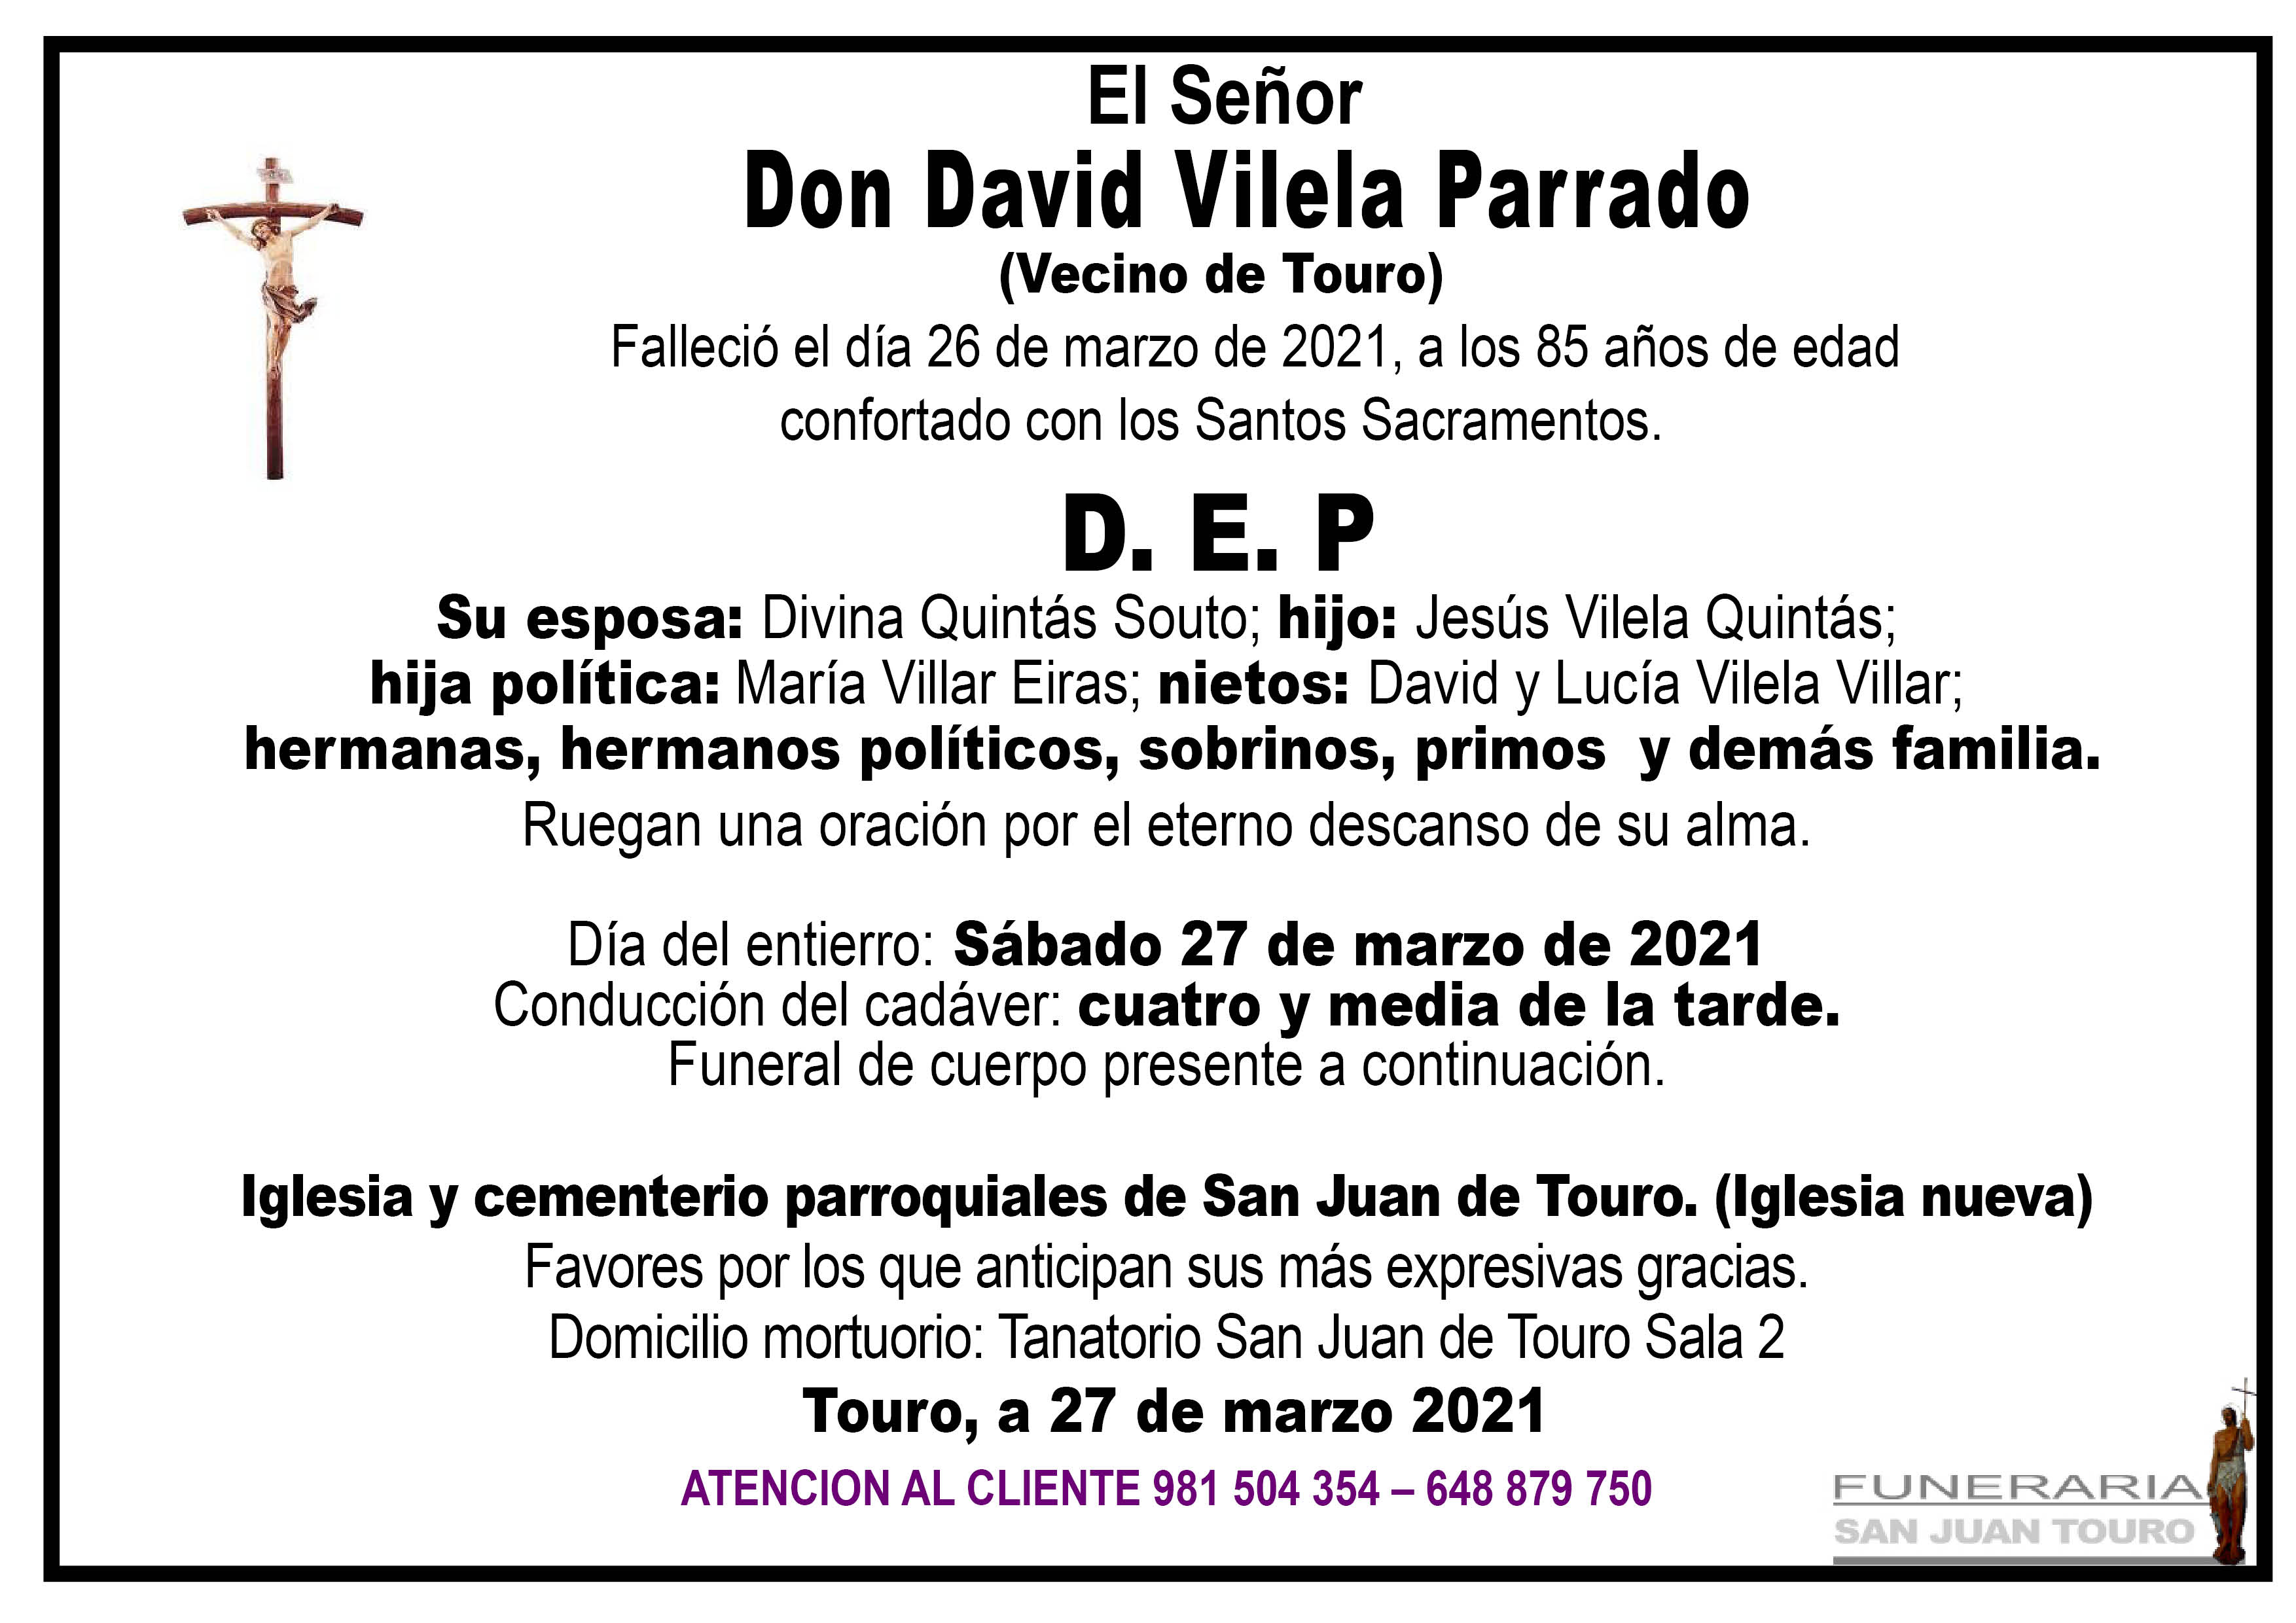 Esquela de SEPELIO DE DON DAVID VILELA PARRADO